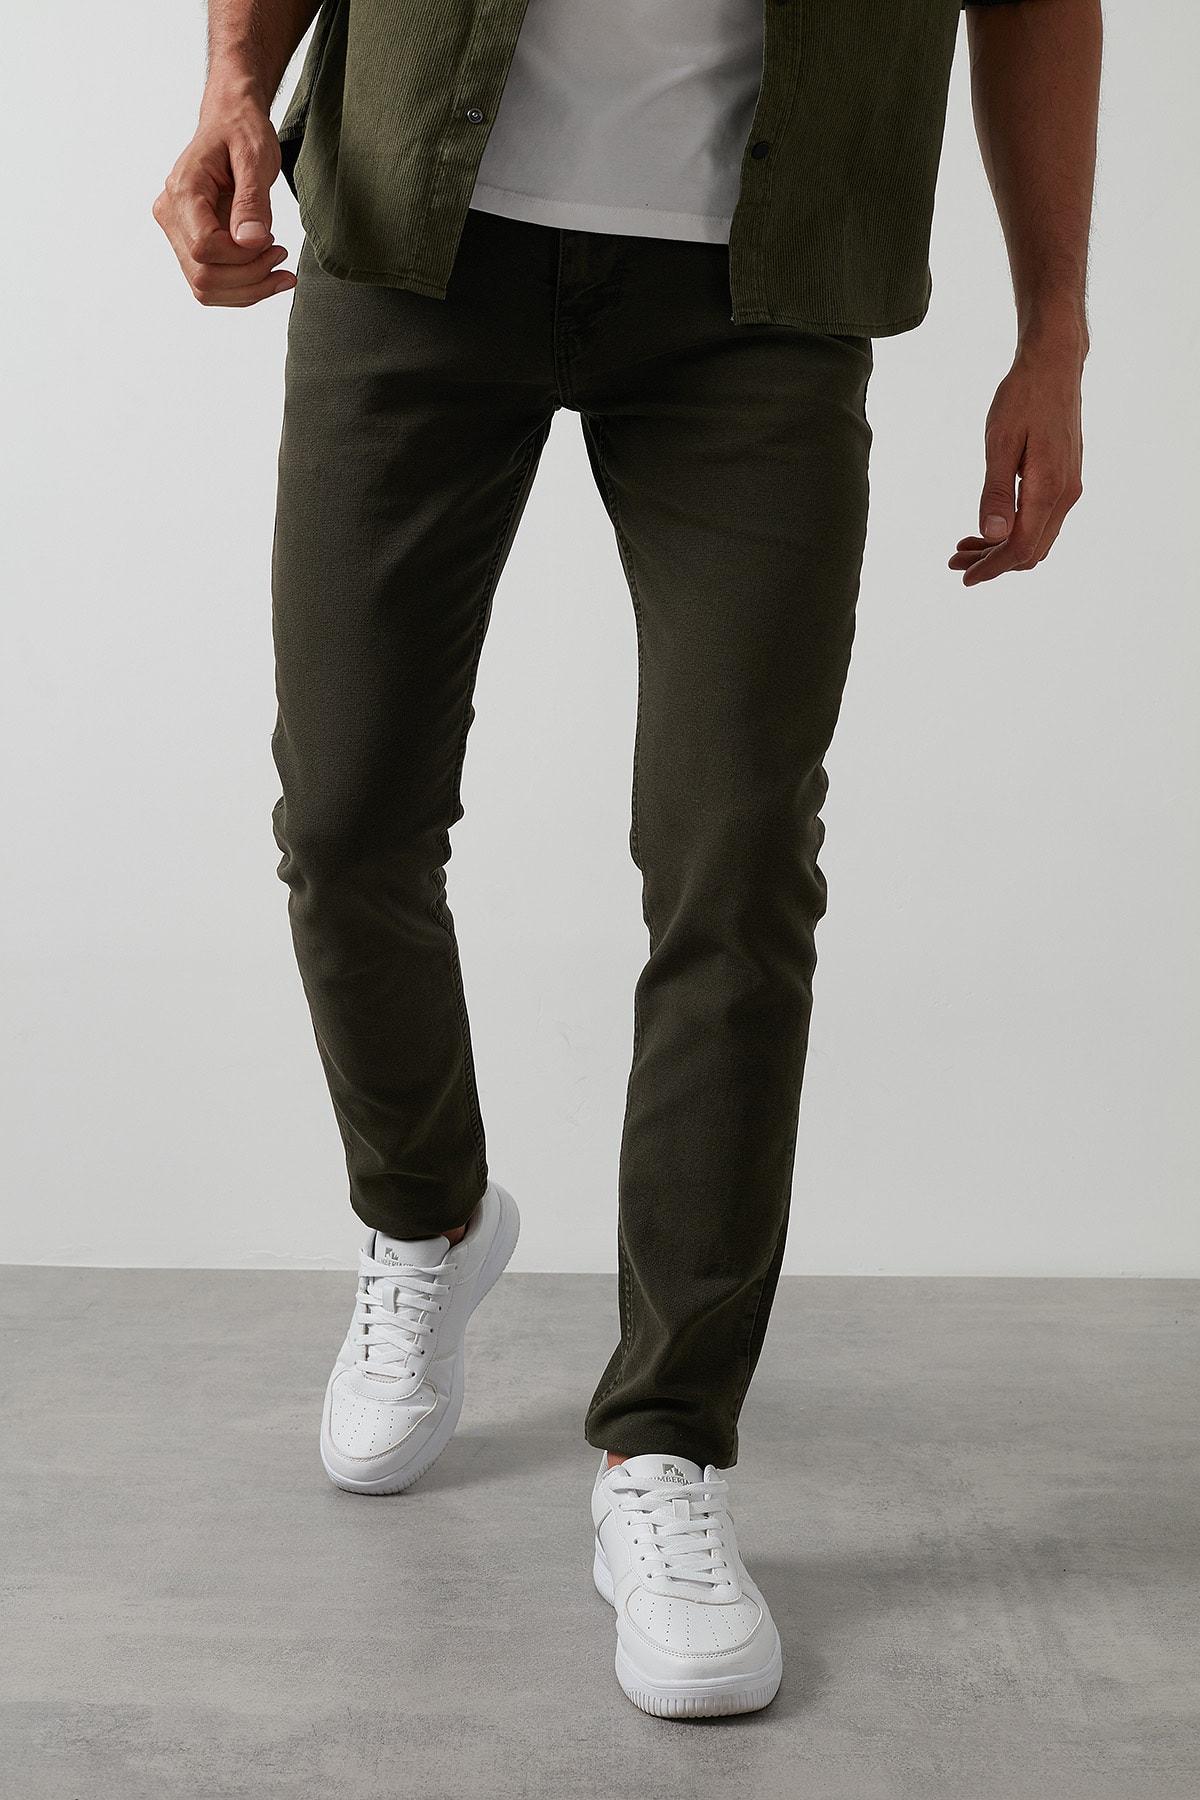 Buratti Erkek Haki 7267f4132zagor Regular Fit Pamuklu Jeans Kot Pantolon 3